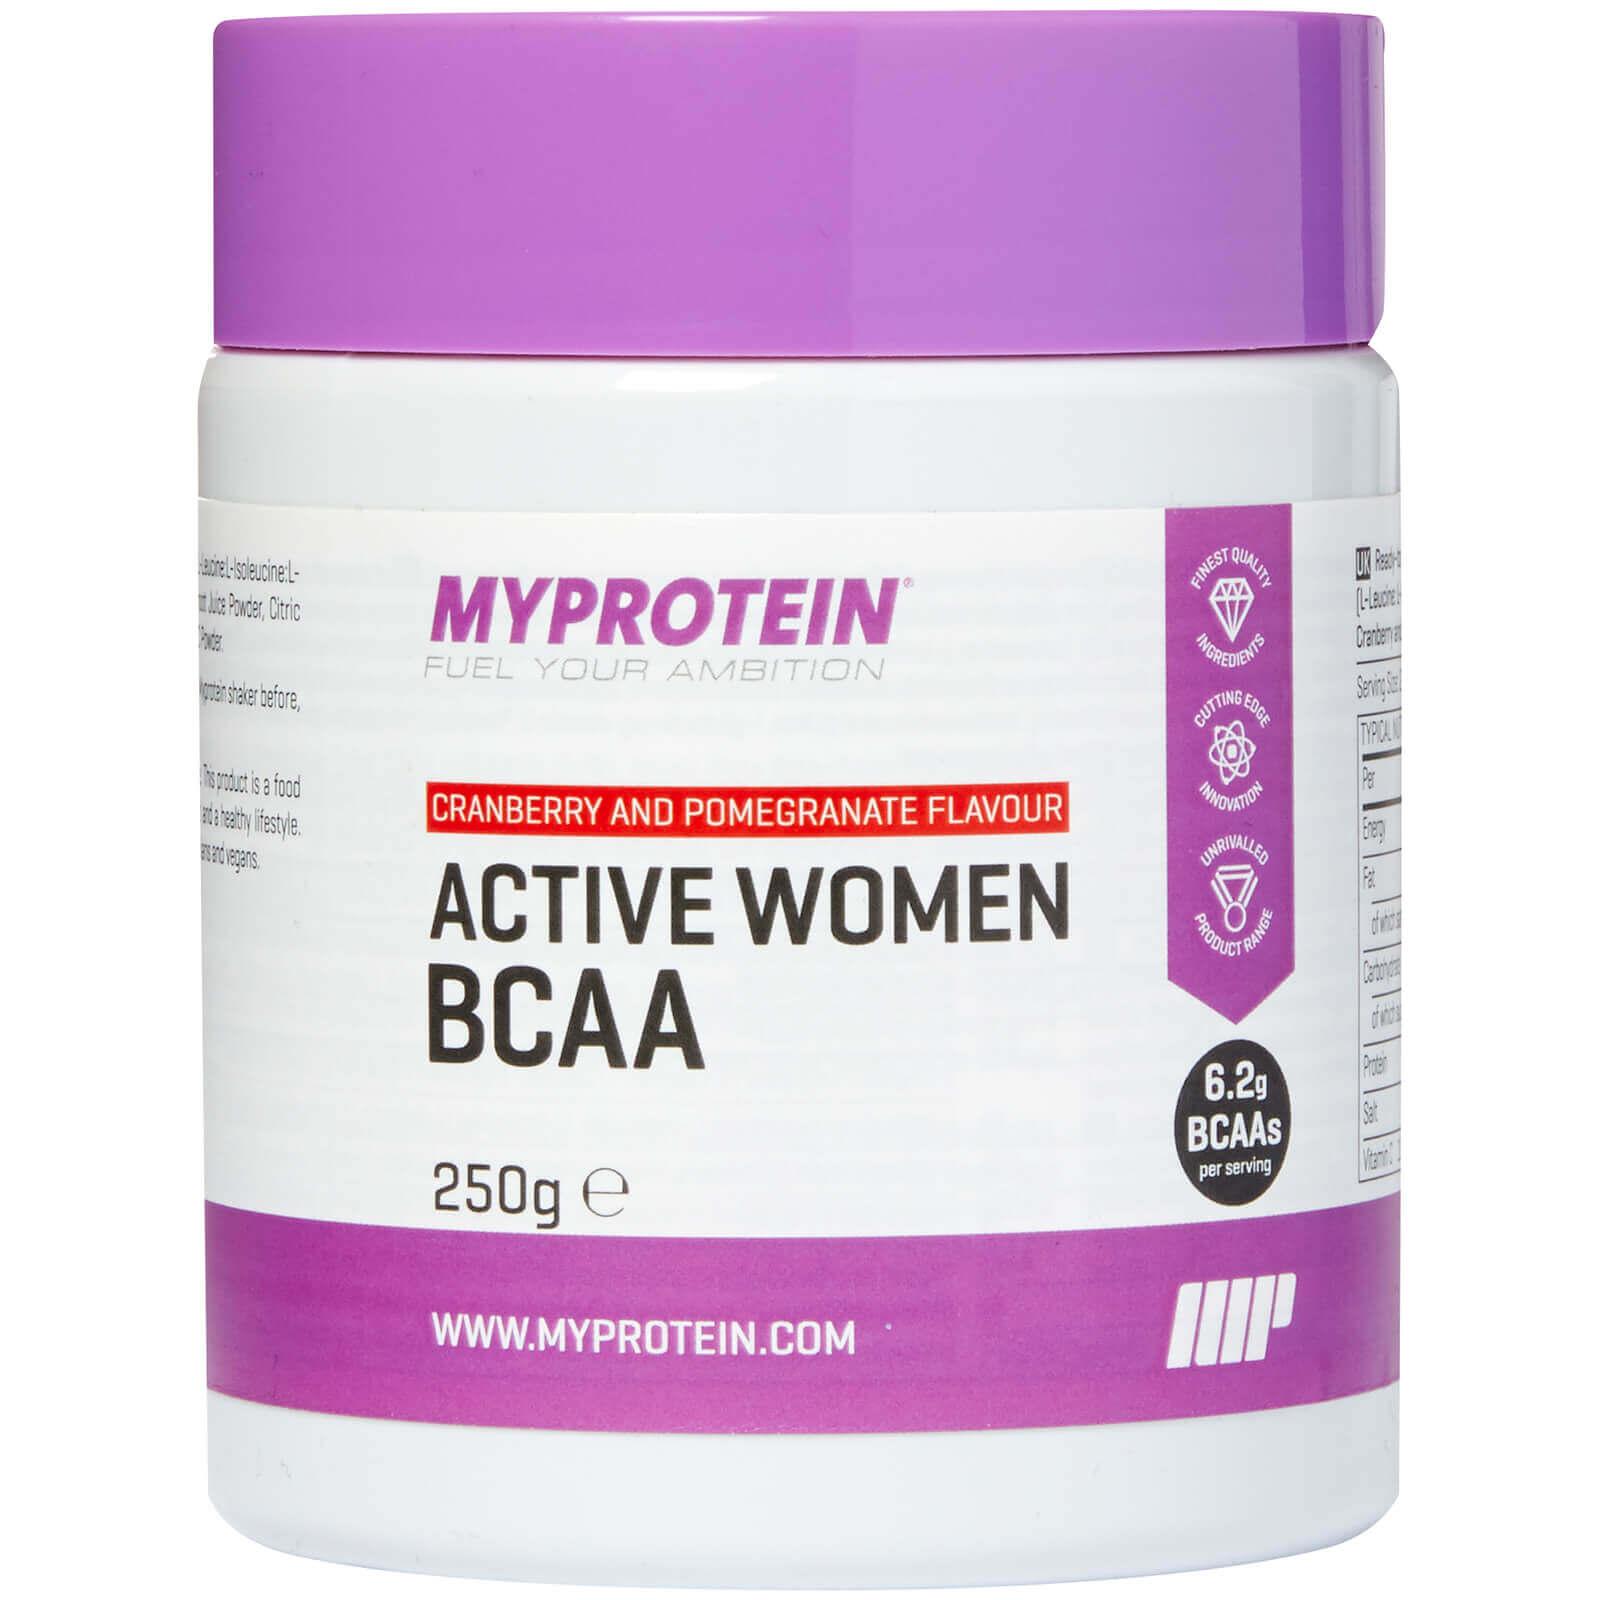 Active Women BCAA